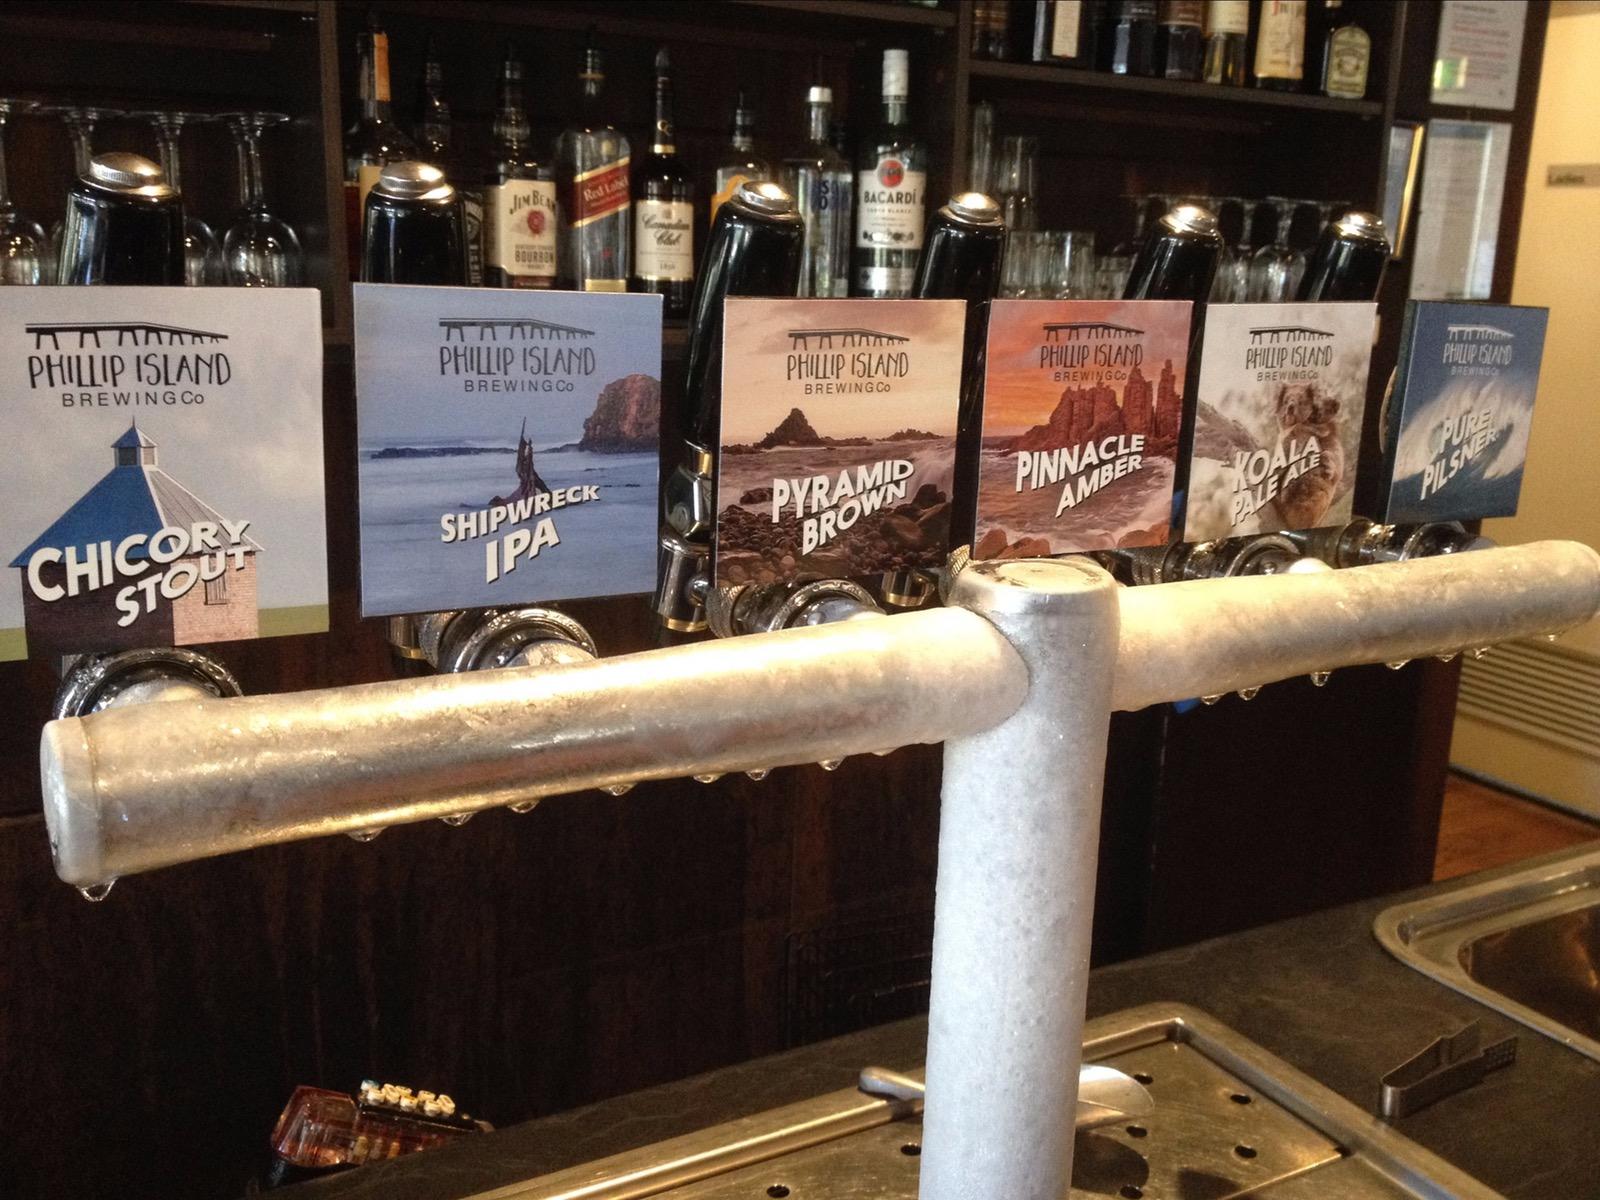 Beer Taps showing Phillip Island Brewery Beers